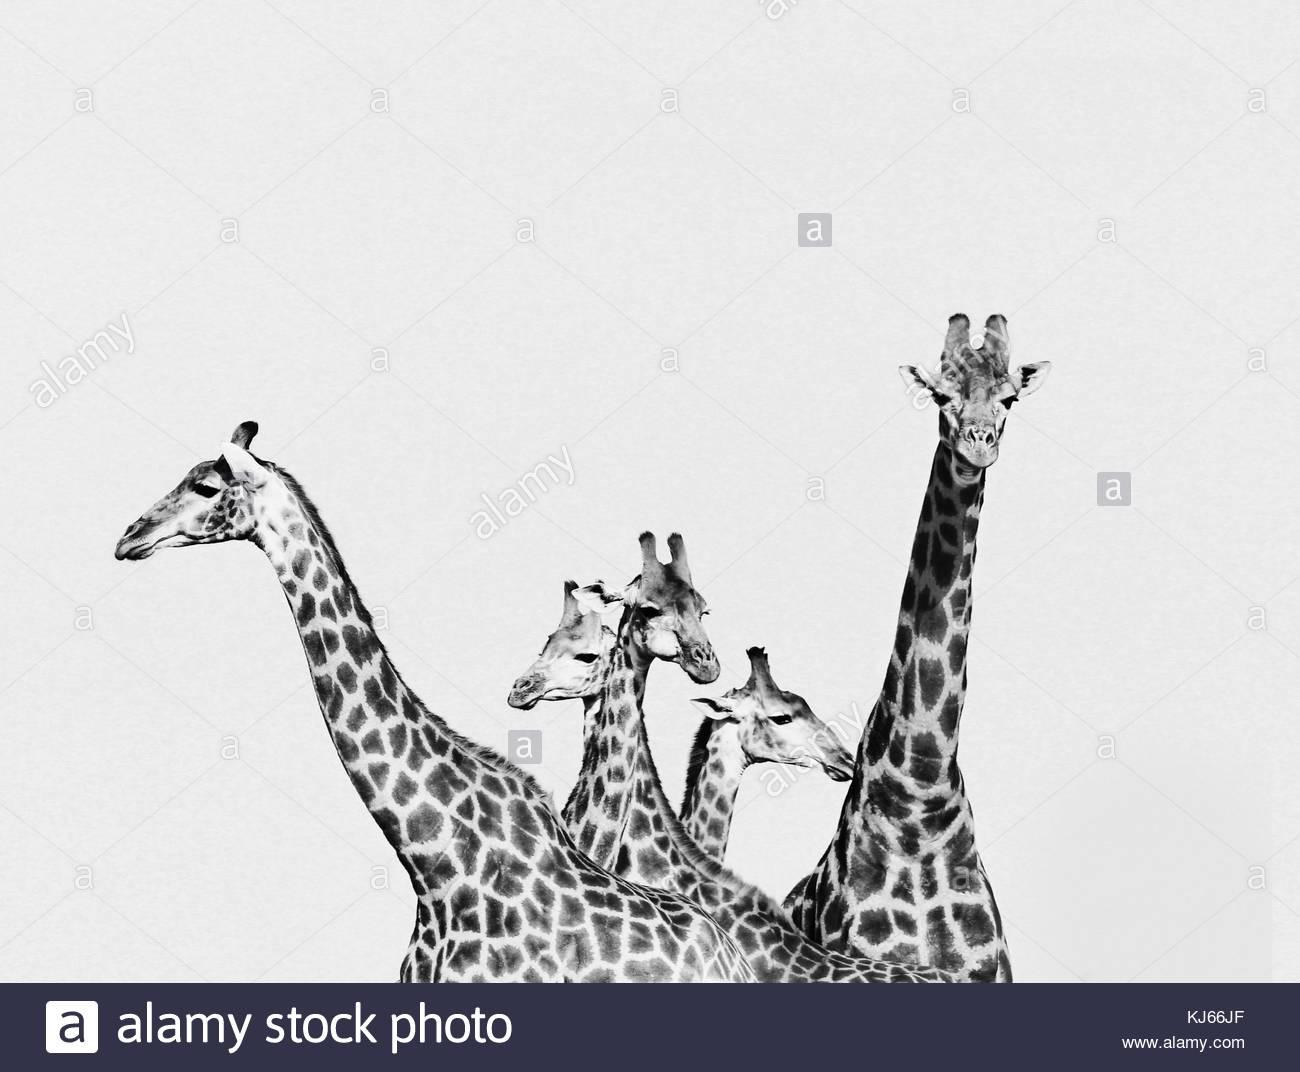 Tower of giraffes - Stock Image